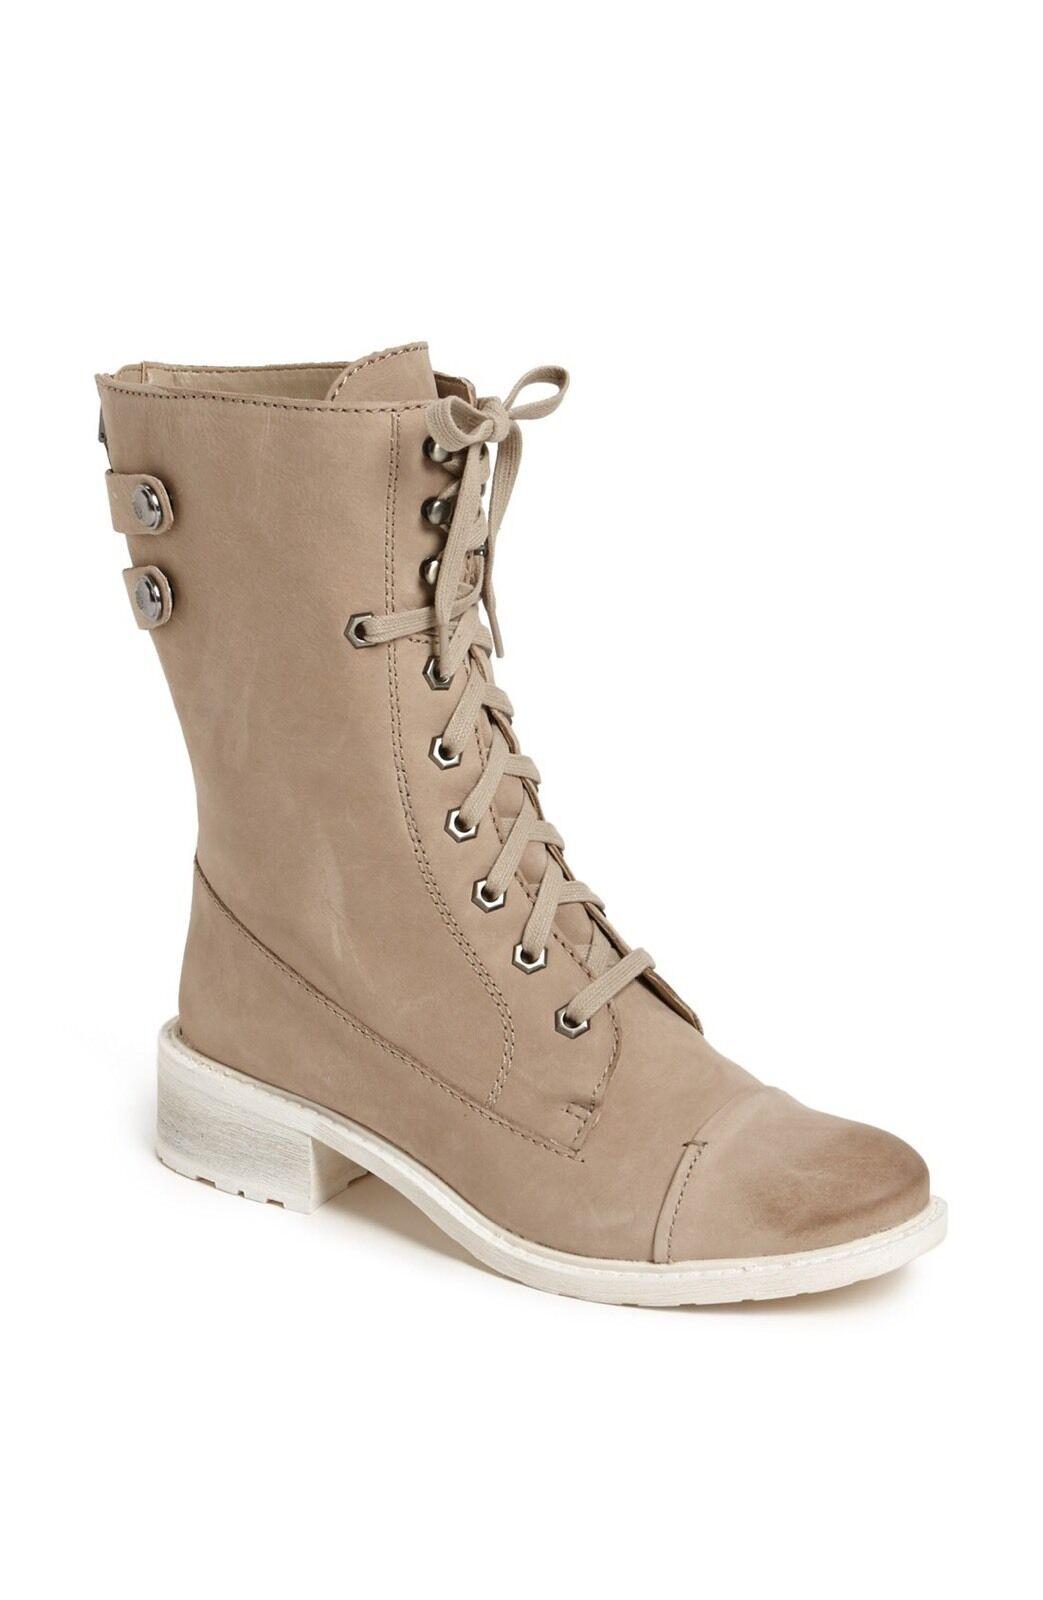 Sam Edelman Darwin Größe 10M Leder Moto Army Military Boot Lace Up Gray sneaker